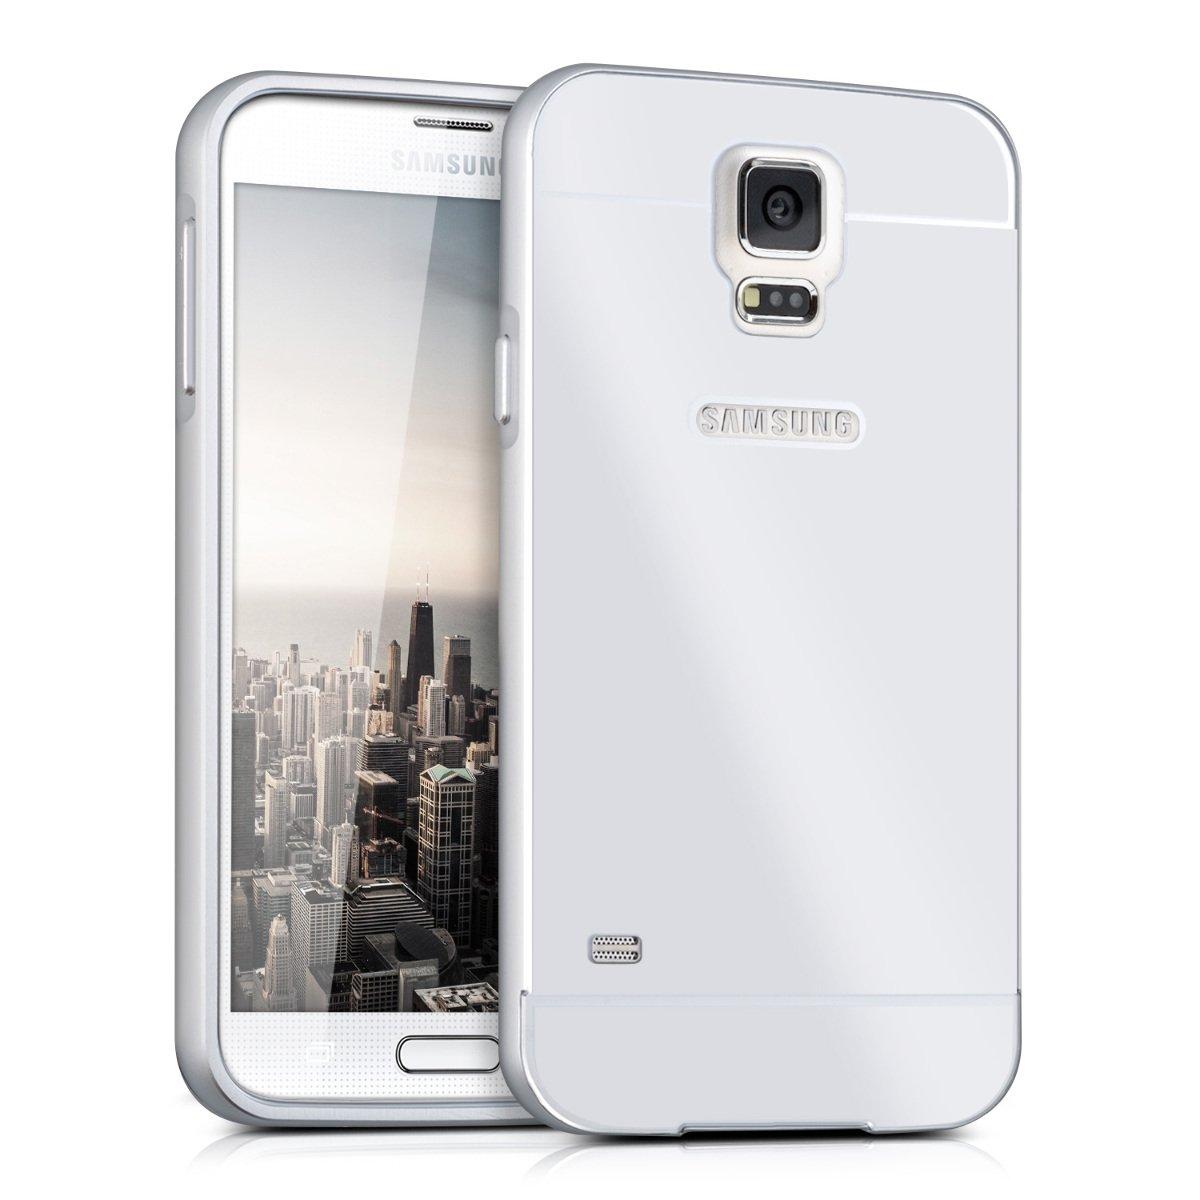 kwmobile Hülle mit Alu-Rahmen für Samsung: Amazon.de: Elektronik